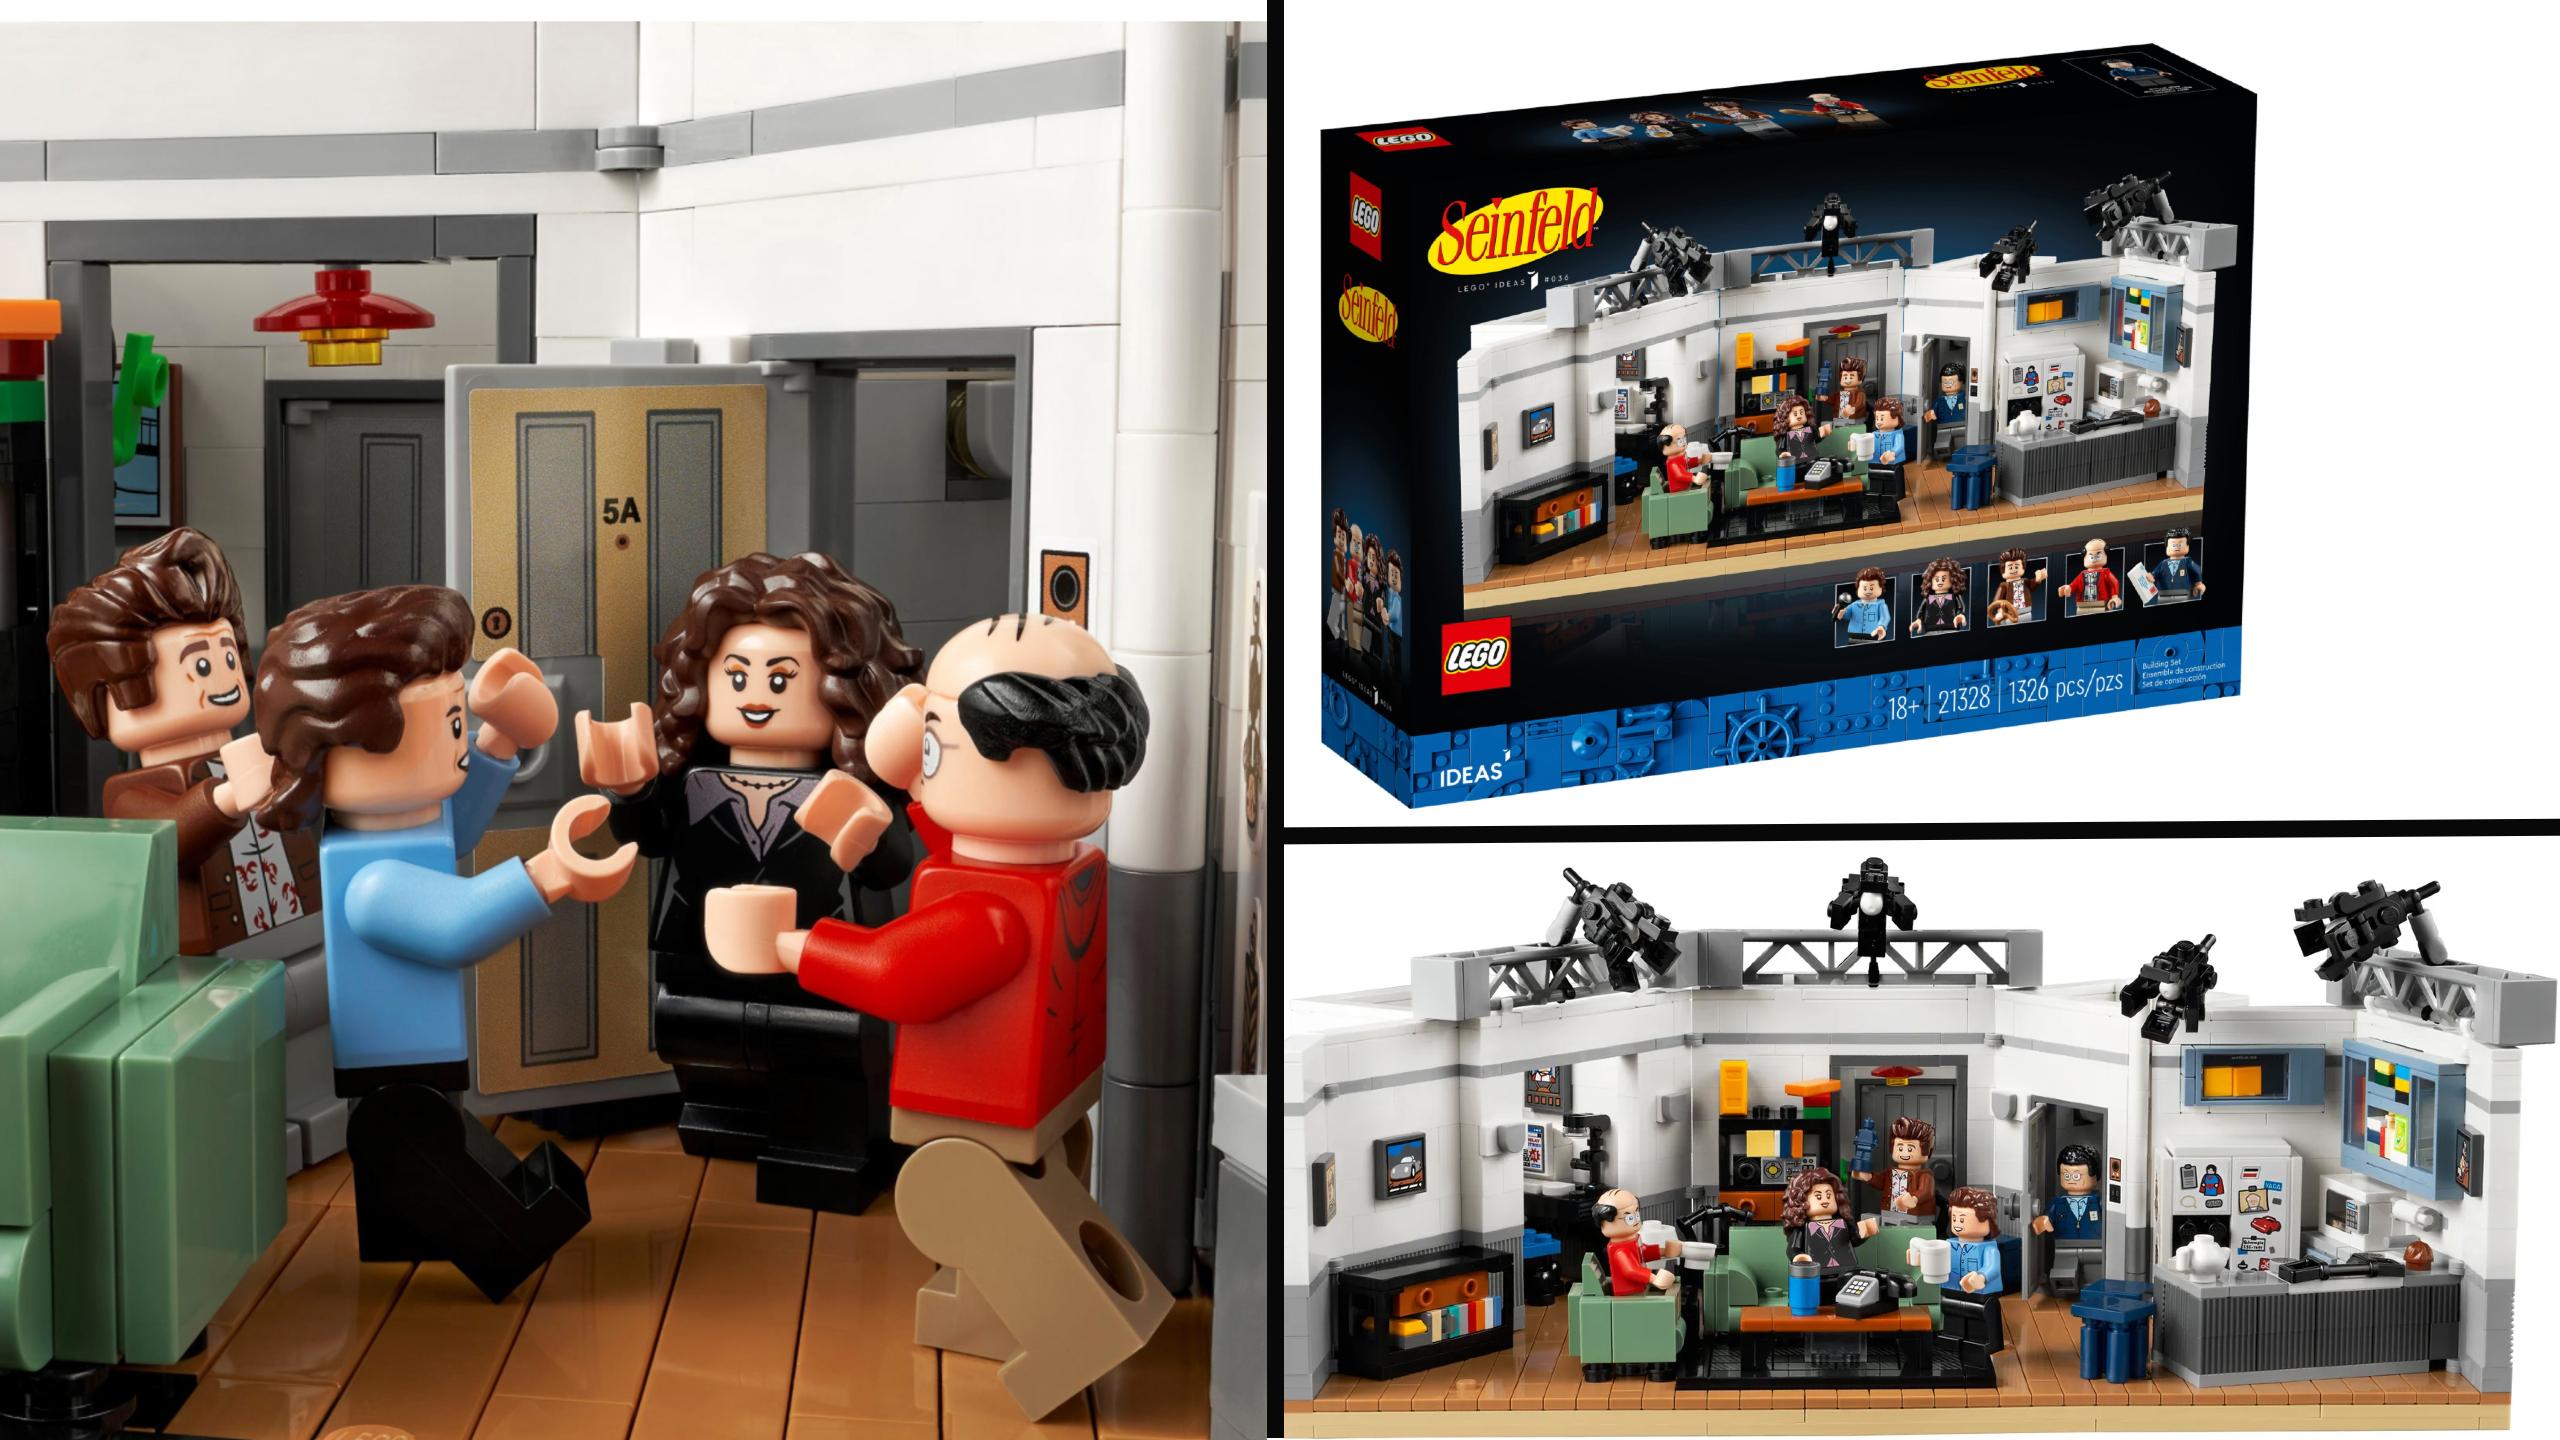 LEGO Seinfeld